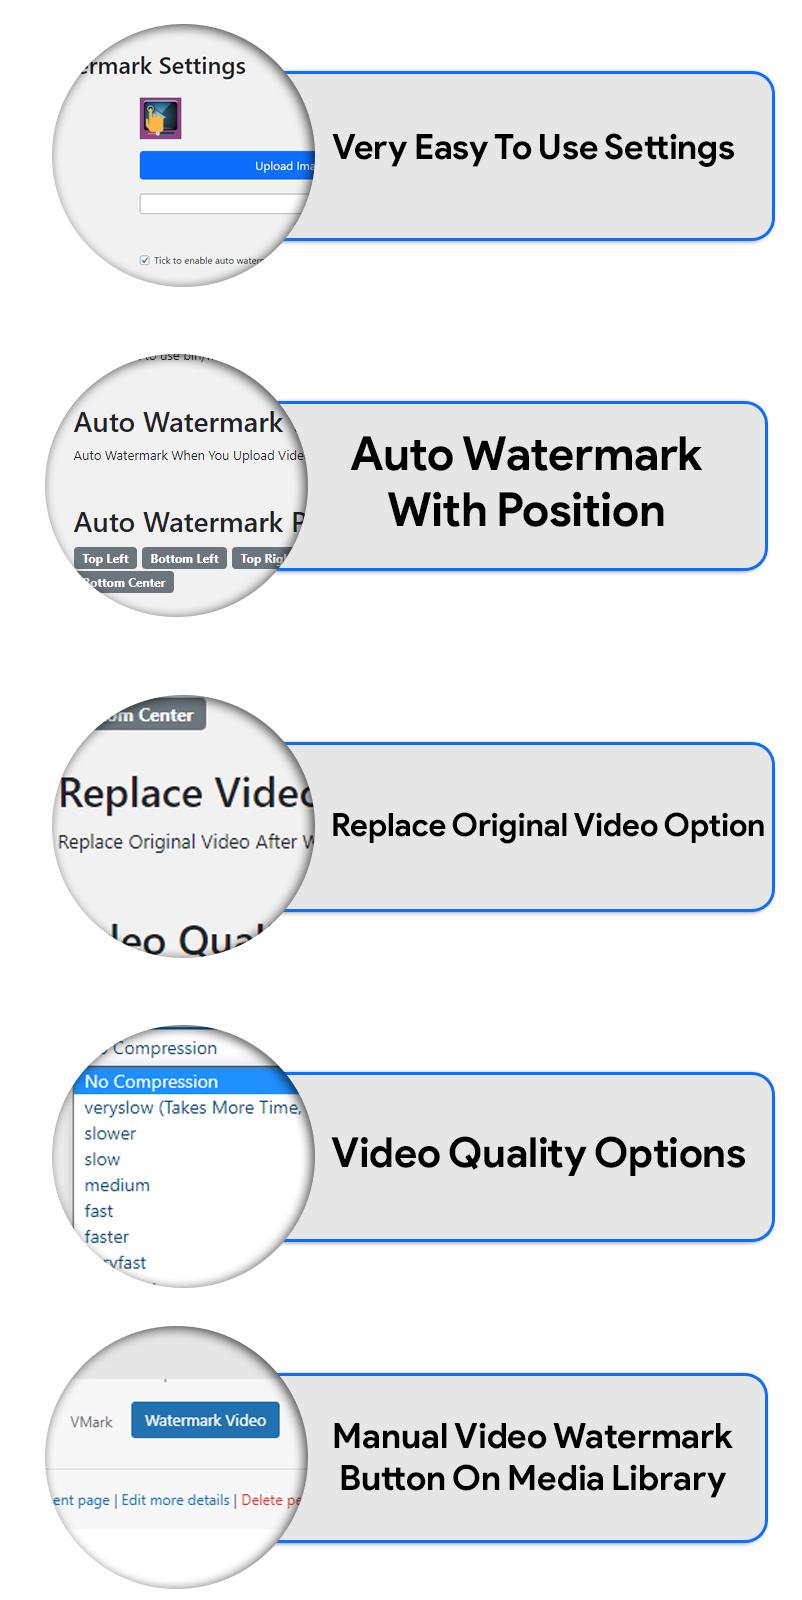 vmark_wp_features-ss.jpg